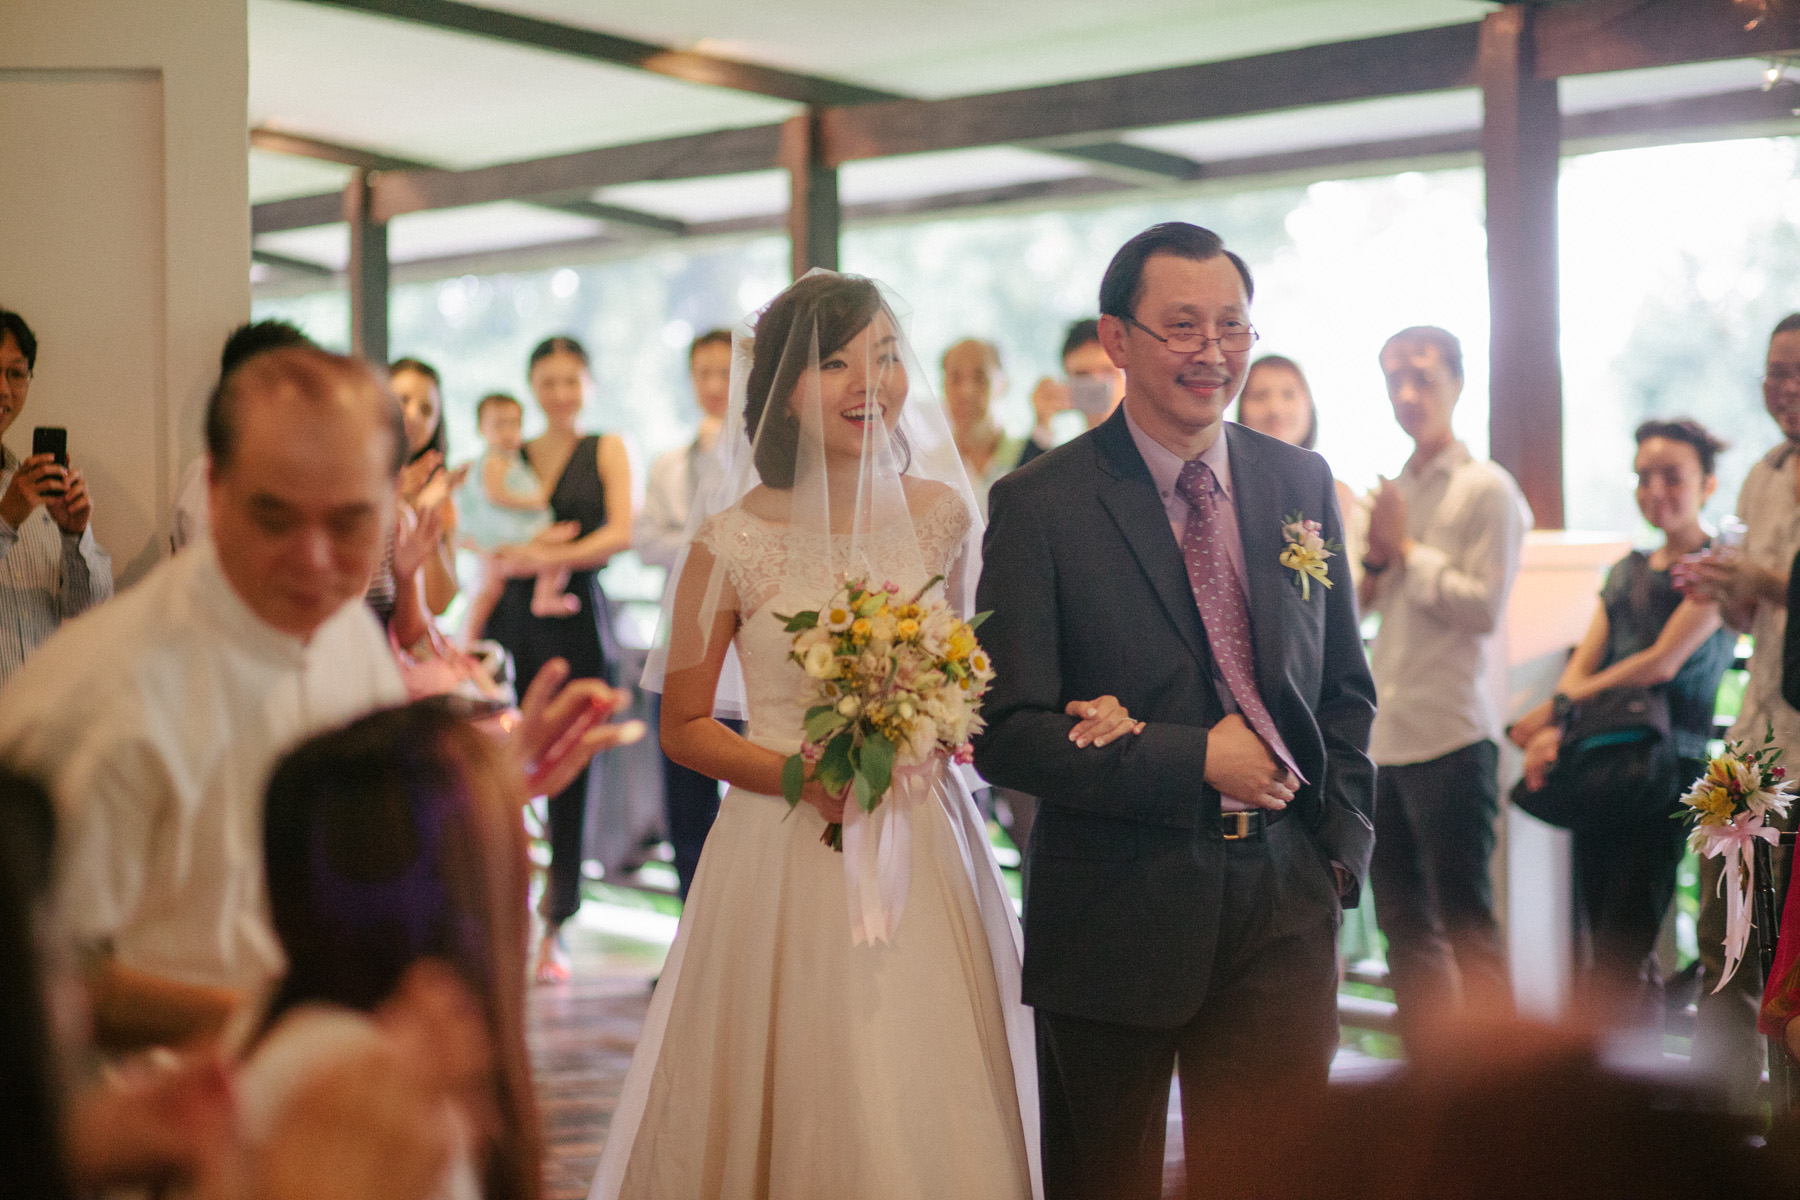 singapore-wedding-travel-photographer-faith-alvin-wedding-wmt-37.jpg